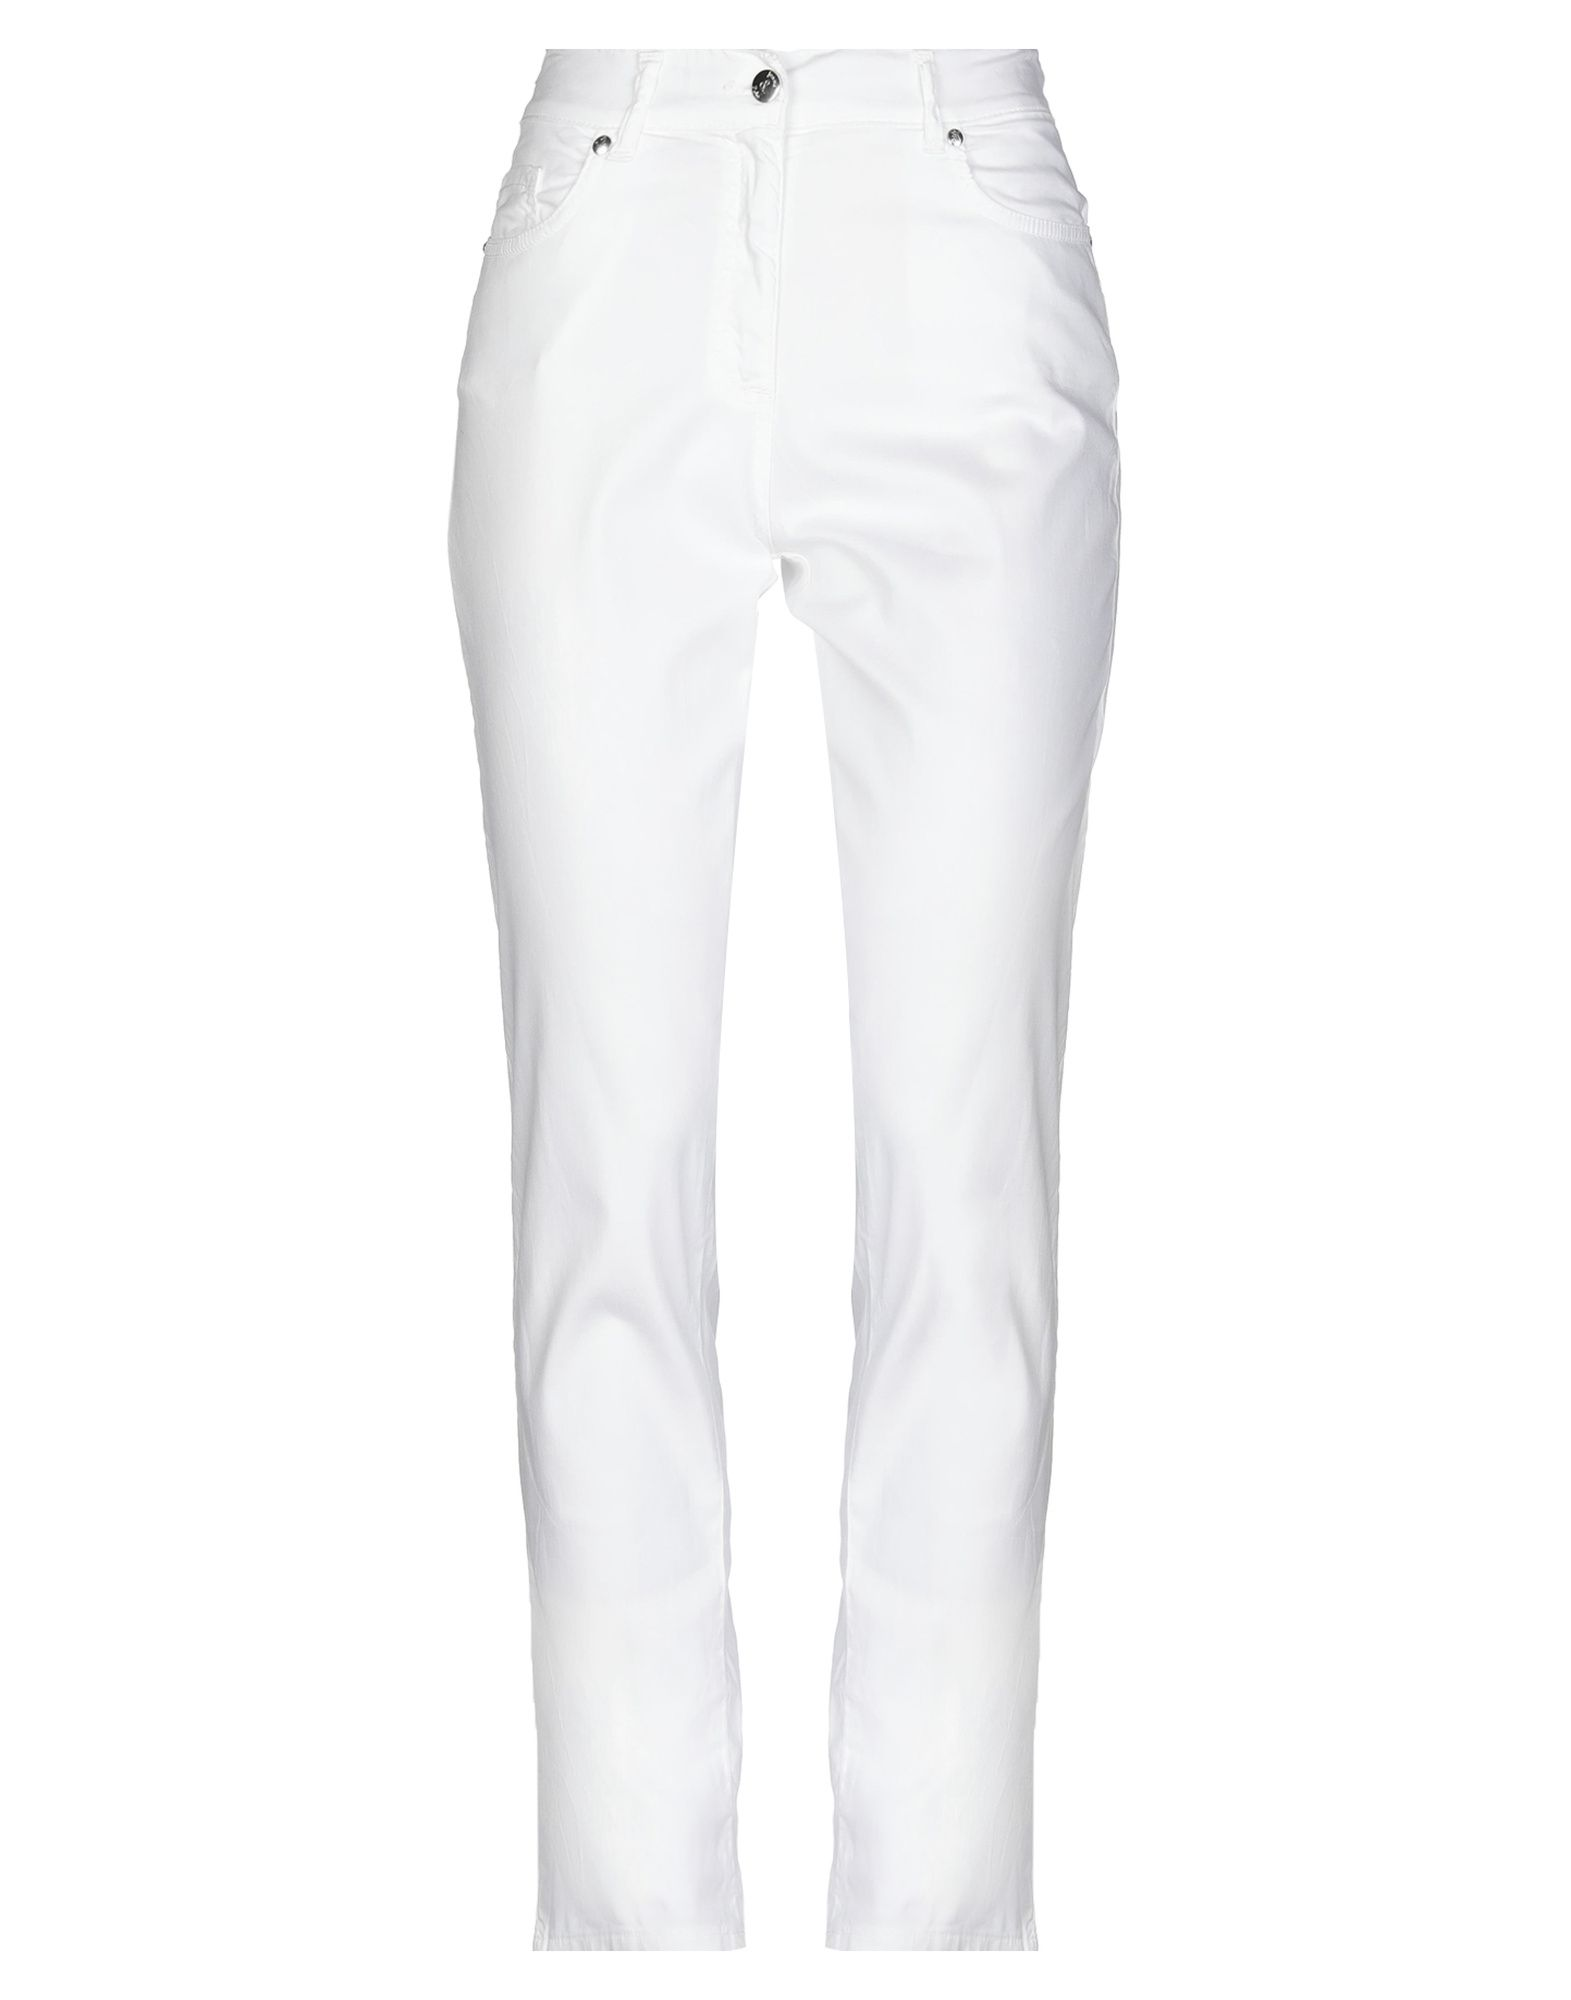 JEANS & POLO Повседневные брюки